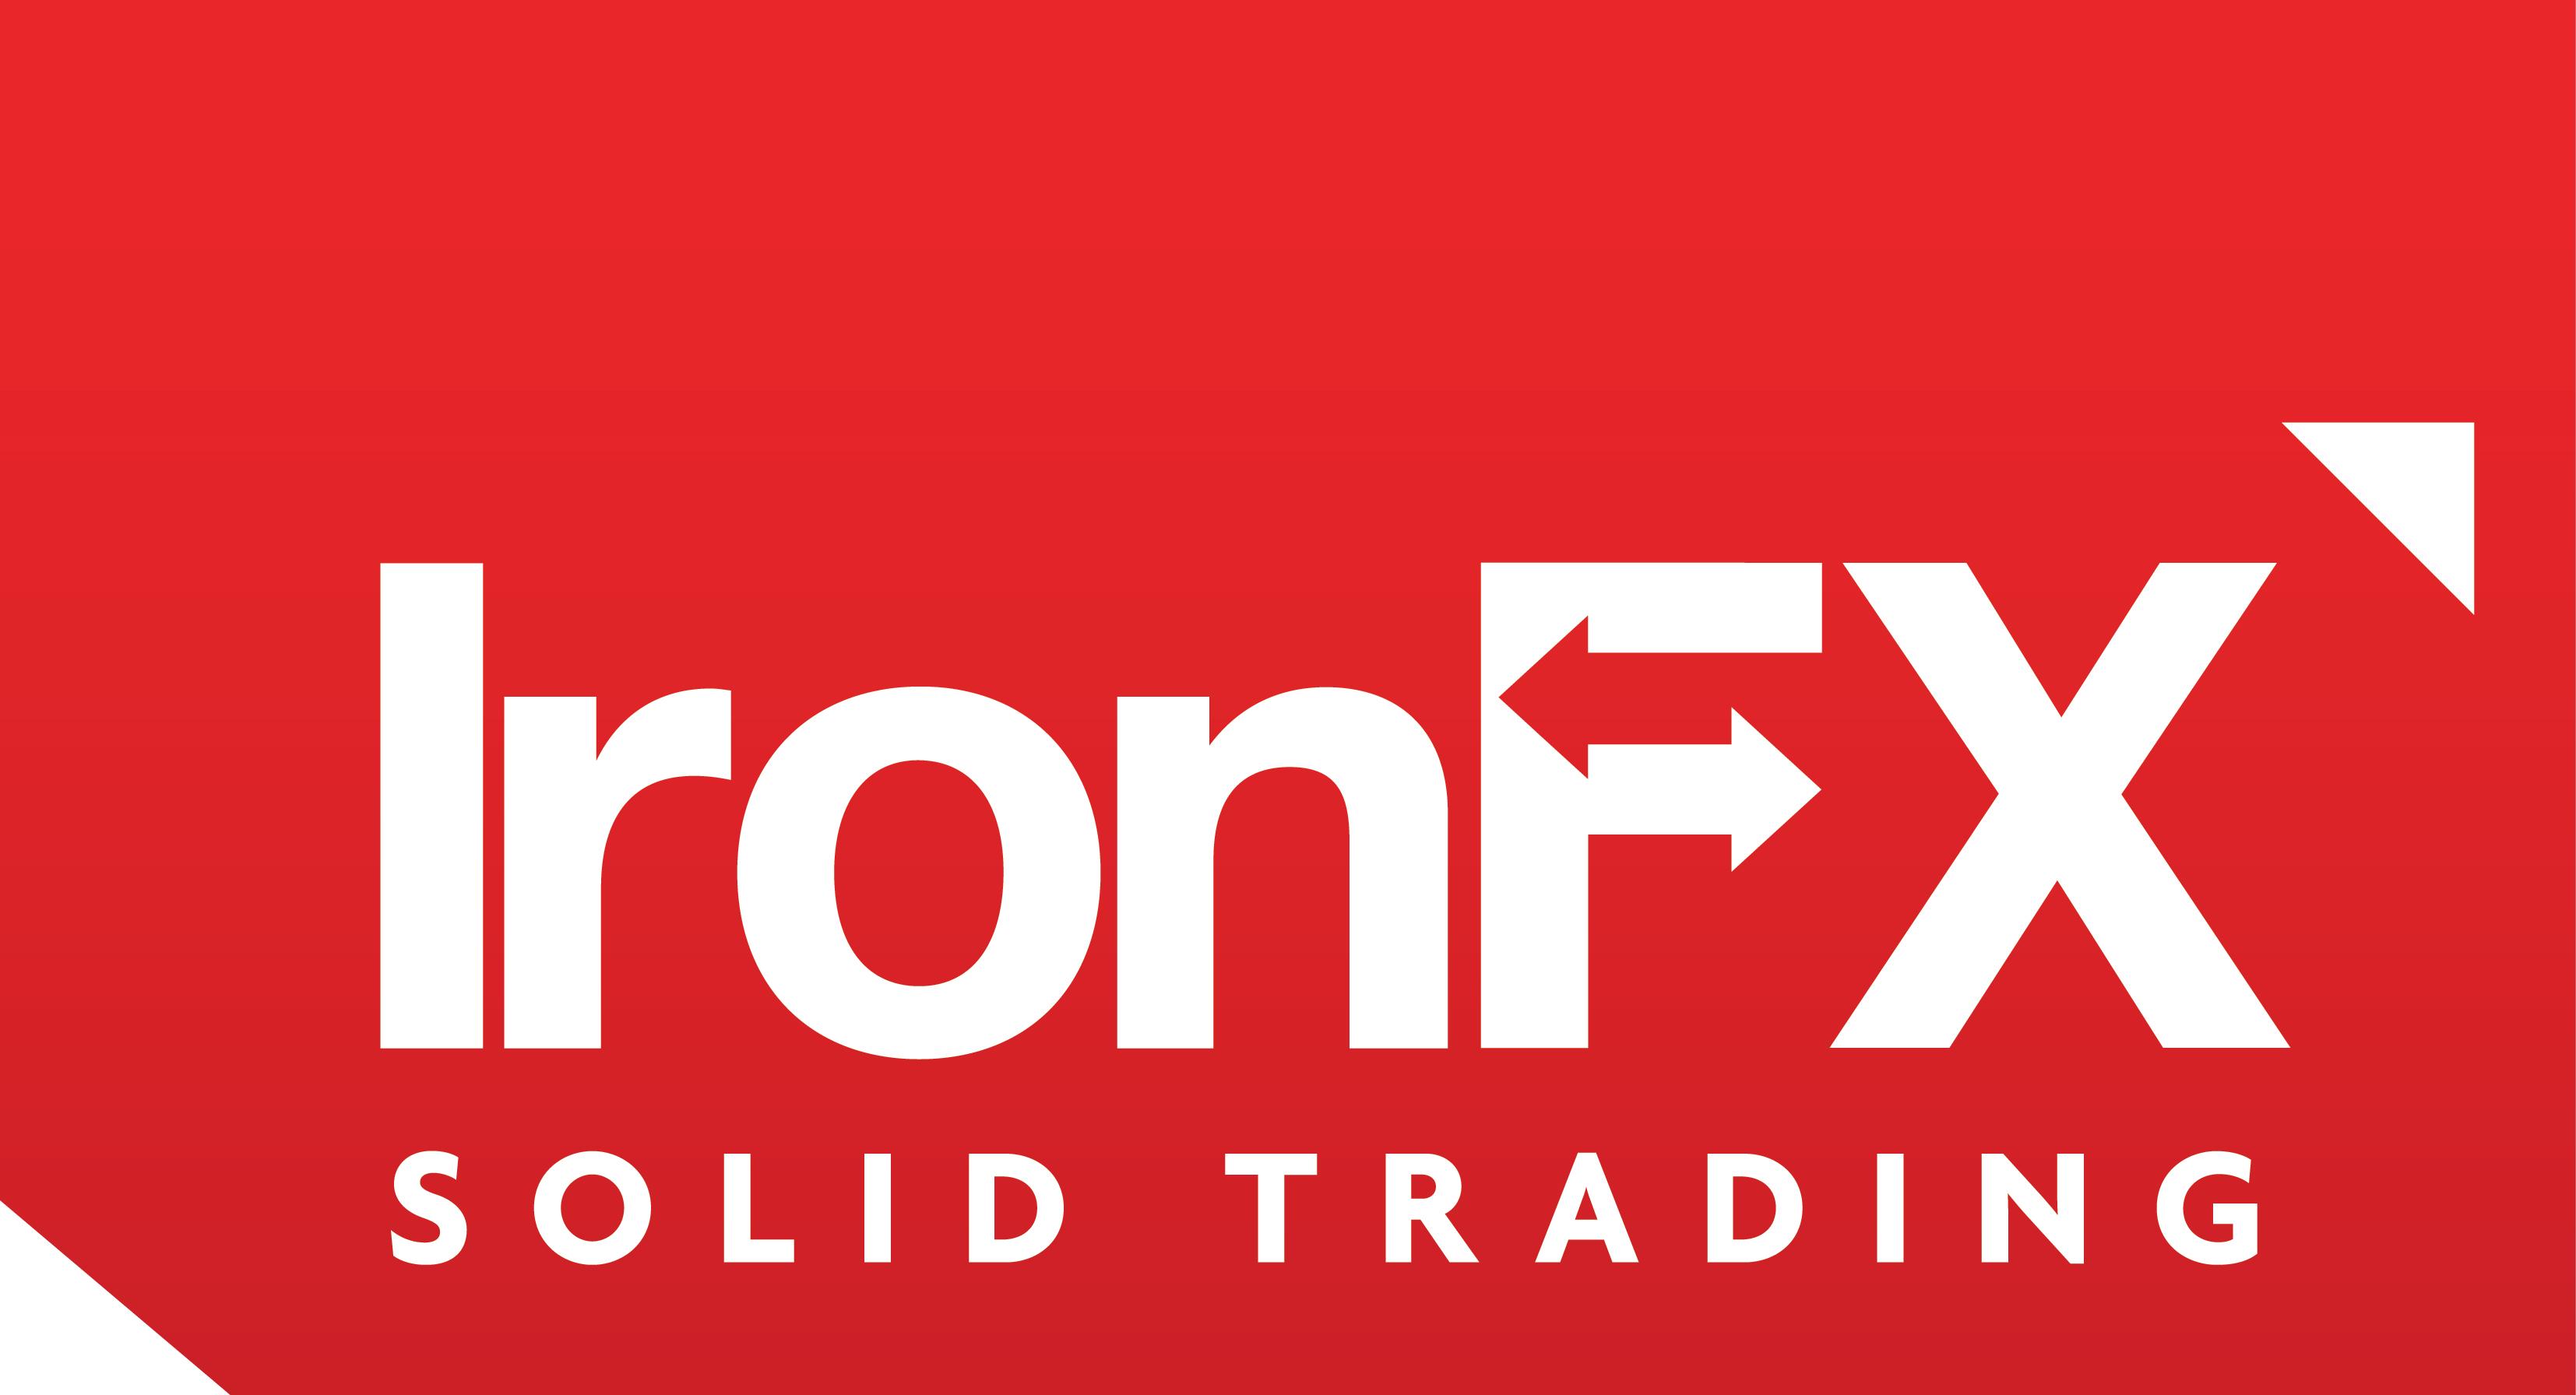 IronFX تواجه دعاوى من قبل المحكمة القبرصية